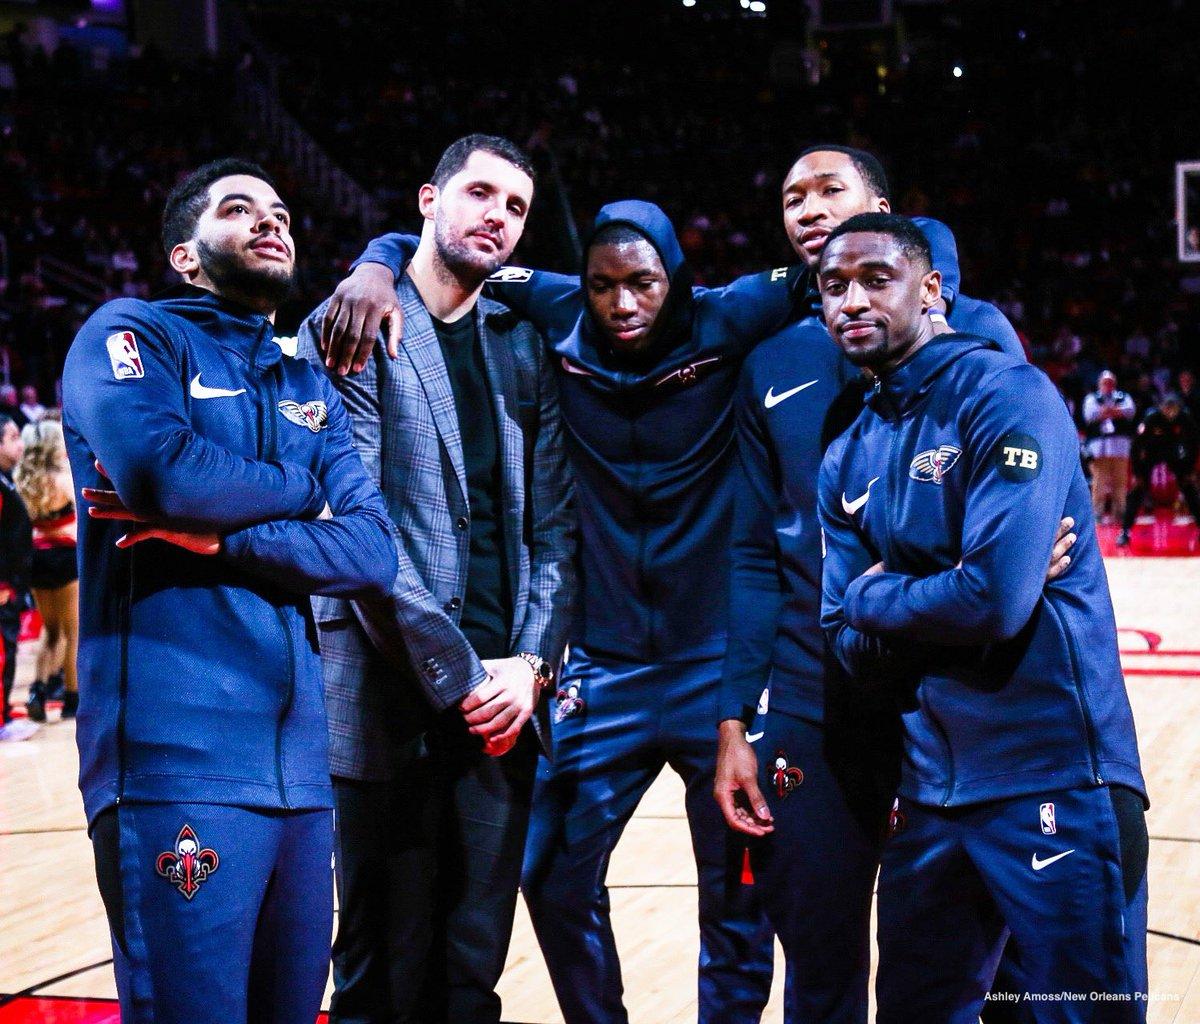 Team win. #doitBIG